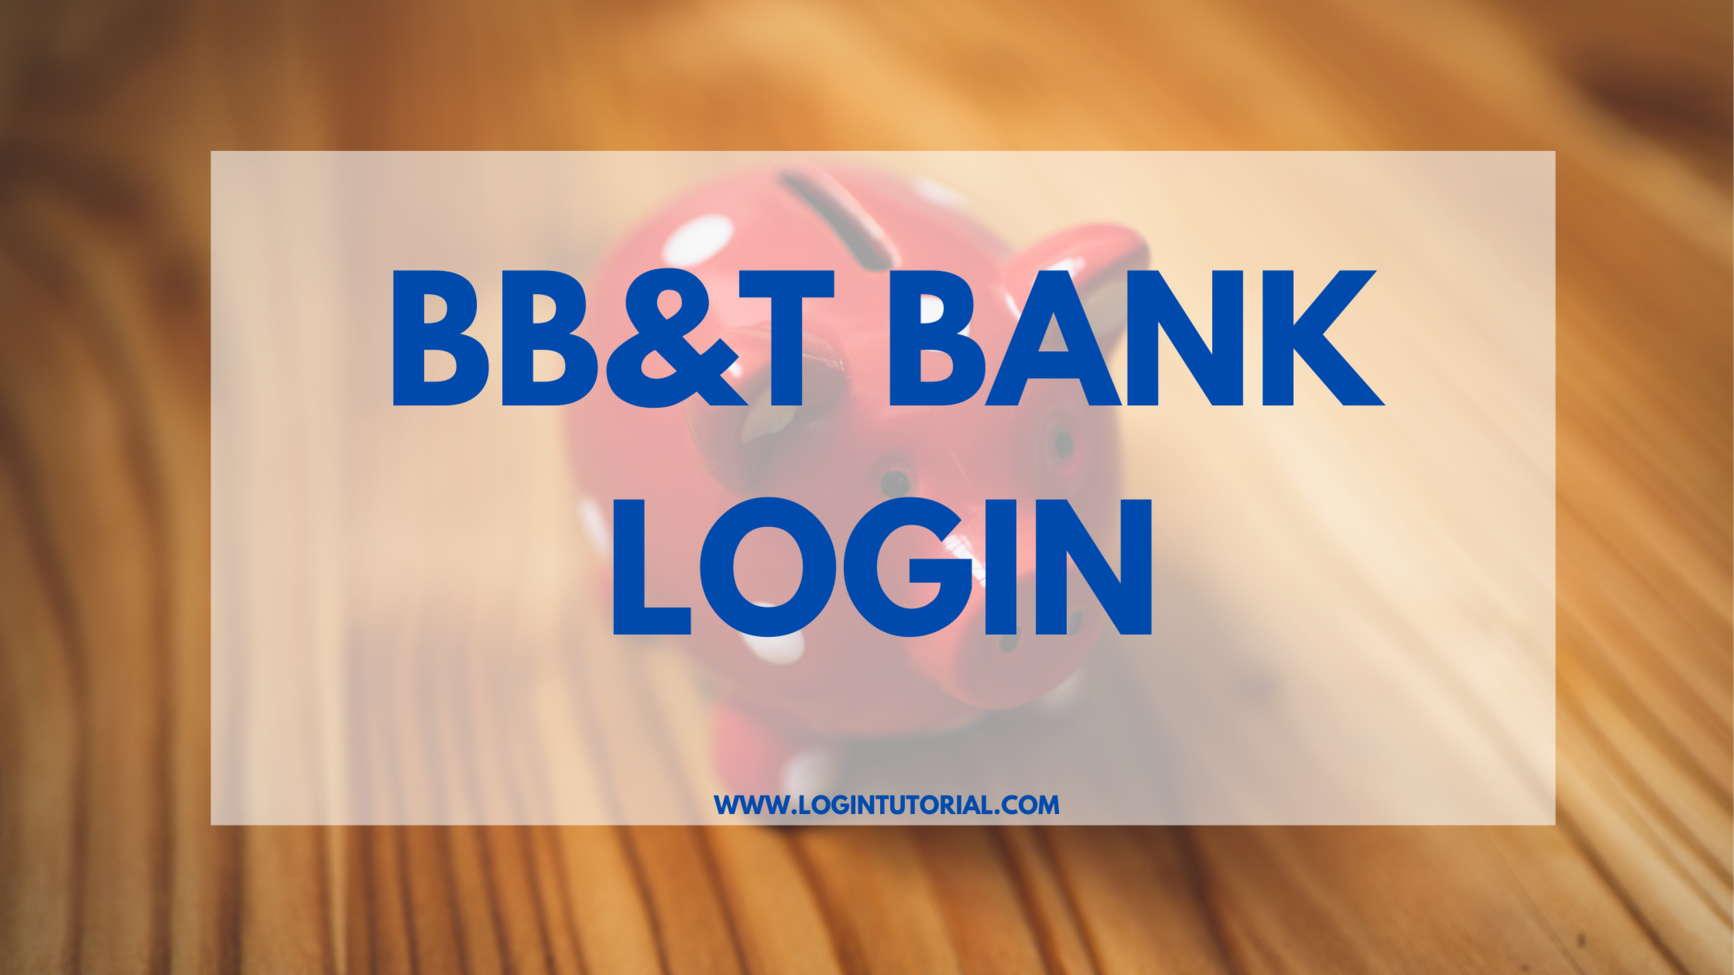 BB&T Bank Login